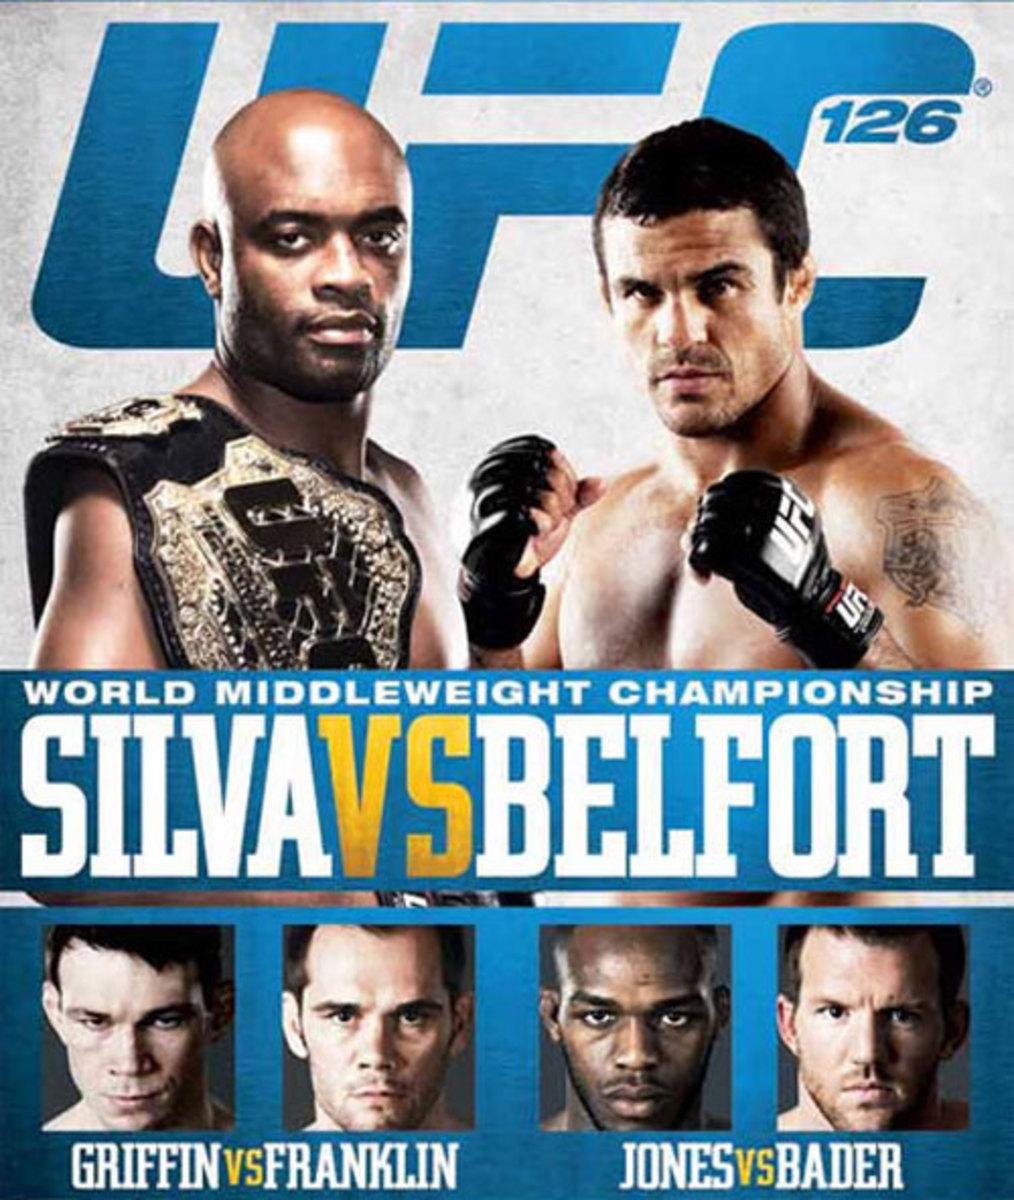 https://i1.wp.com/mmaweekly.com/wp-content/uploads/2011/01/UFC-126-poster.jpg